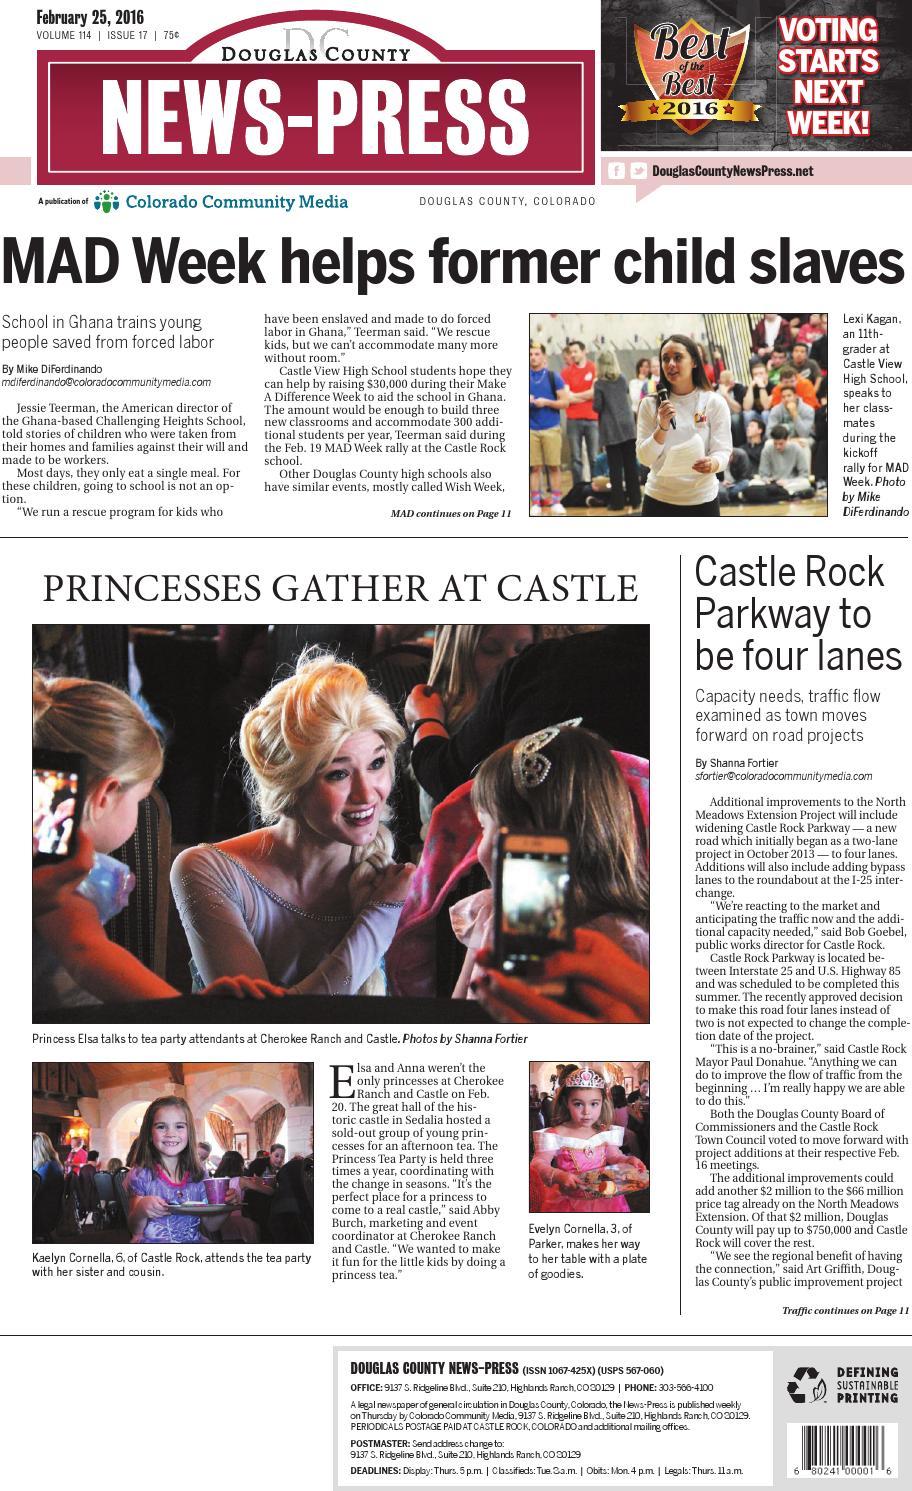 Douglas County News-Press 0225 by Colorado Community Media - issuu